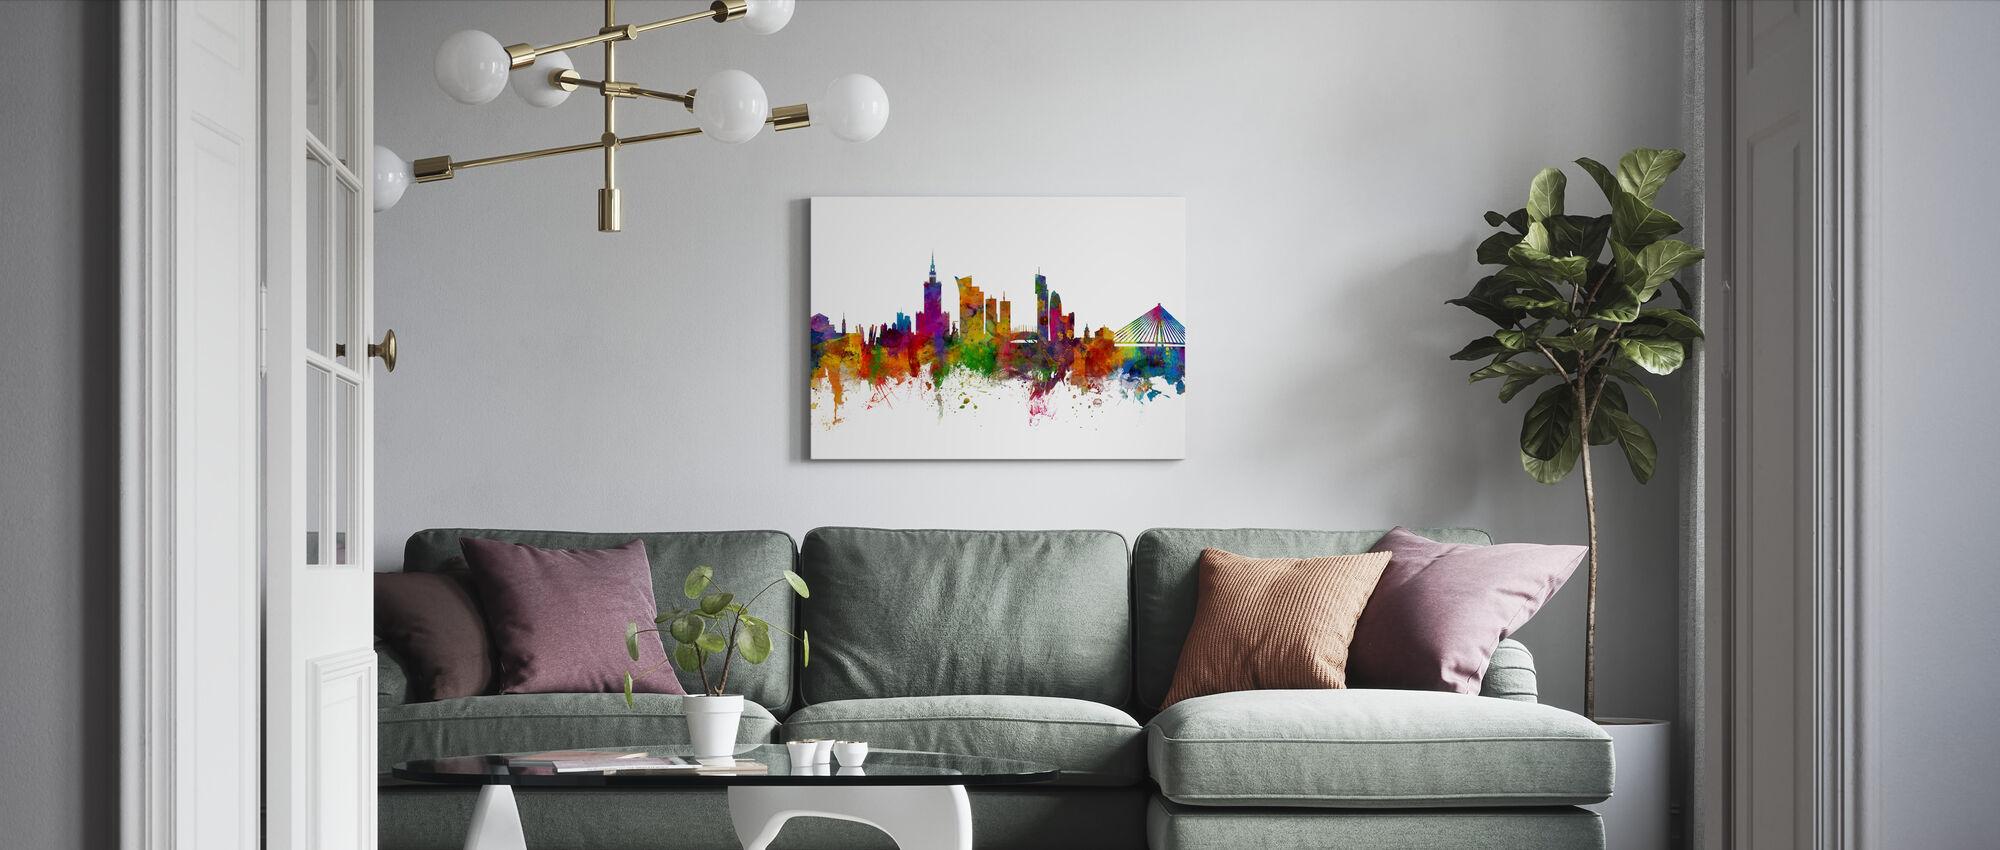 Warsaw Skyline - Canvas print - Living Room